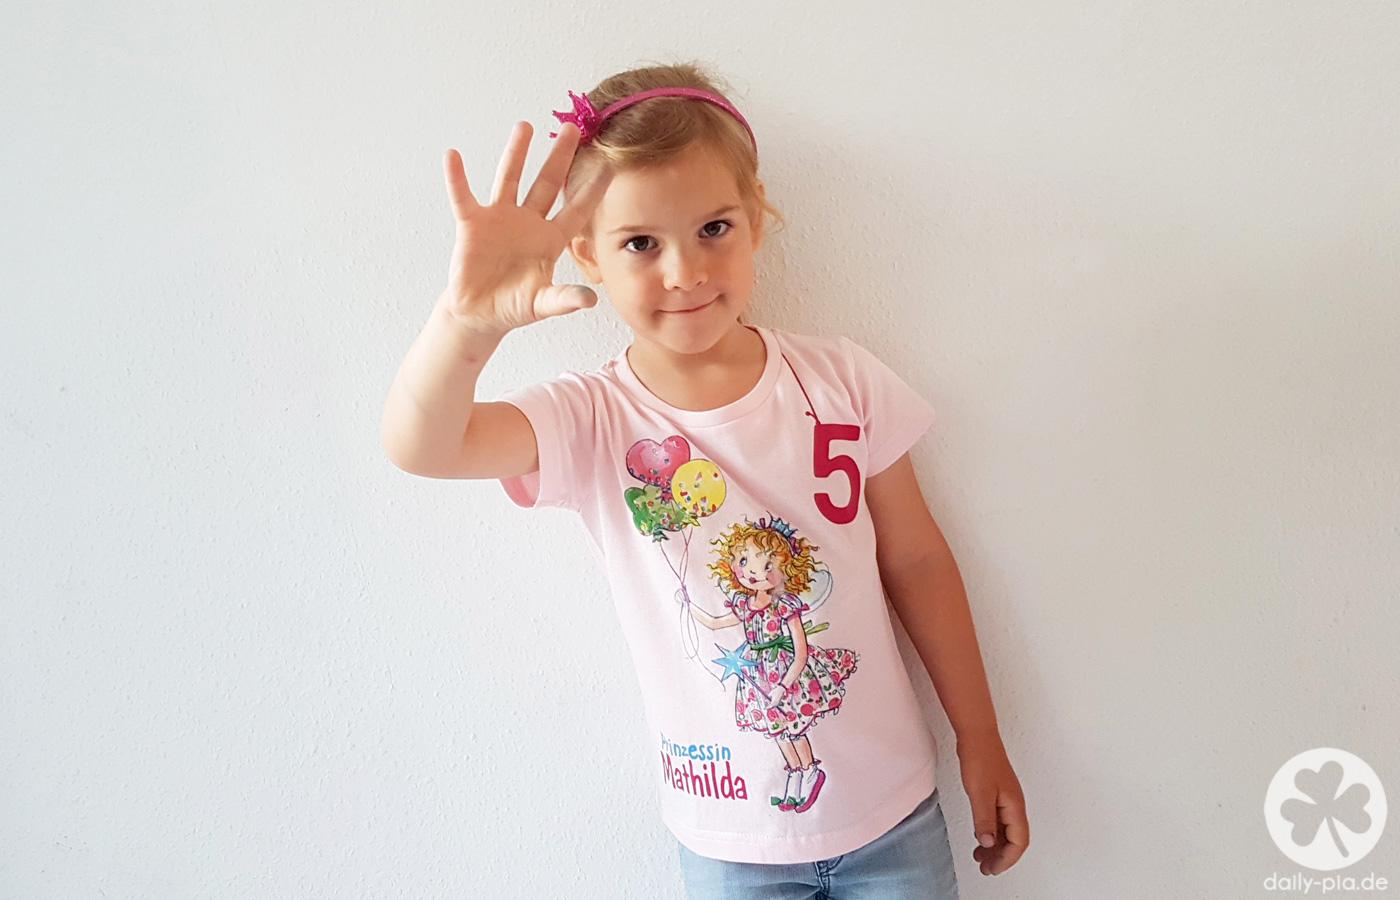 Prinzessin Mimifee ist jetzt 5!